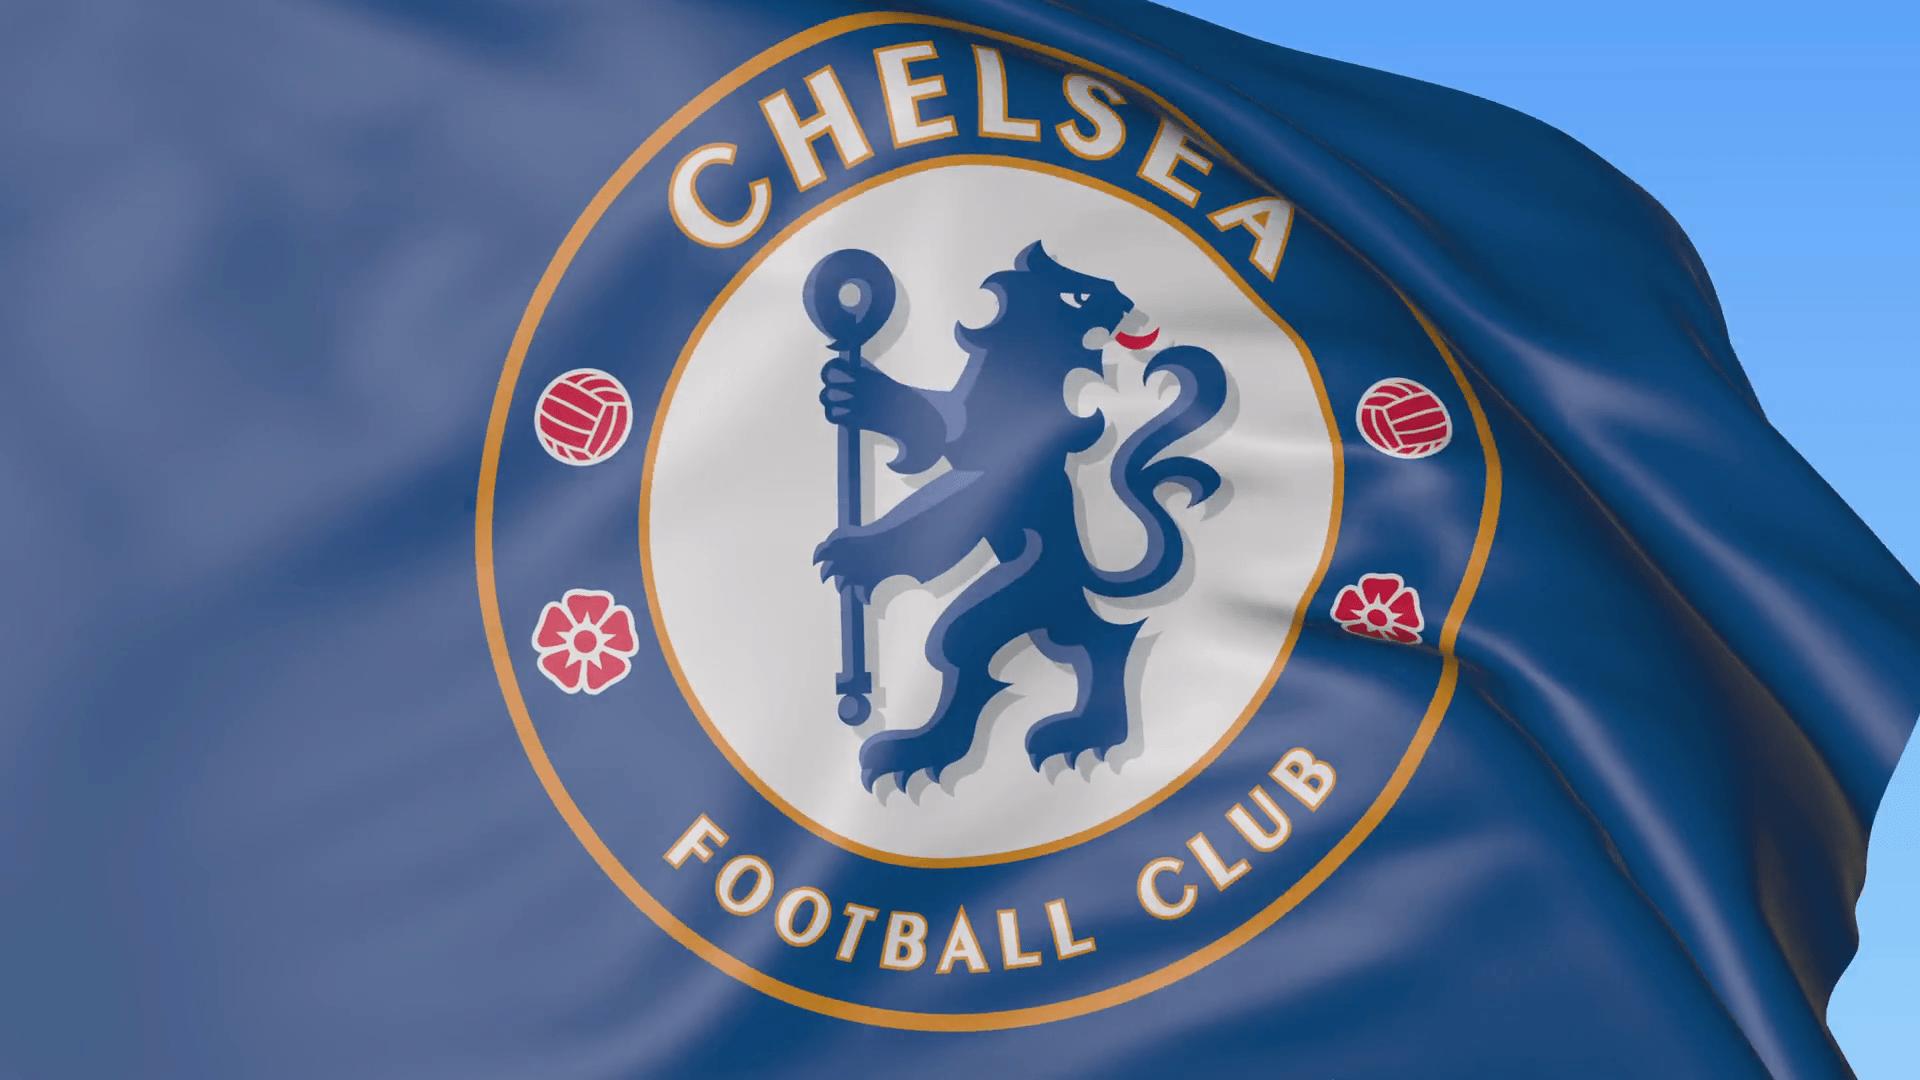 chelsea logo - Transfer: Real Madrid top midfielder speaks after signing for Chelsea